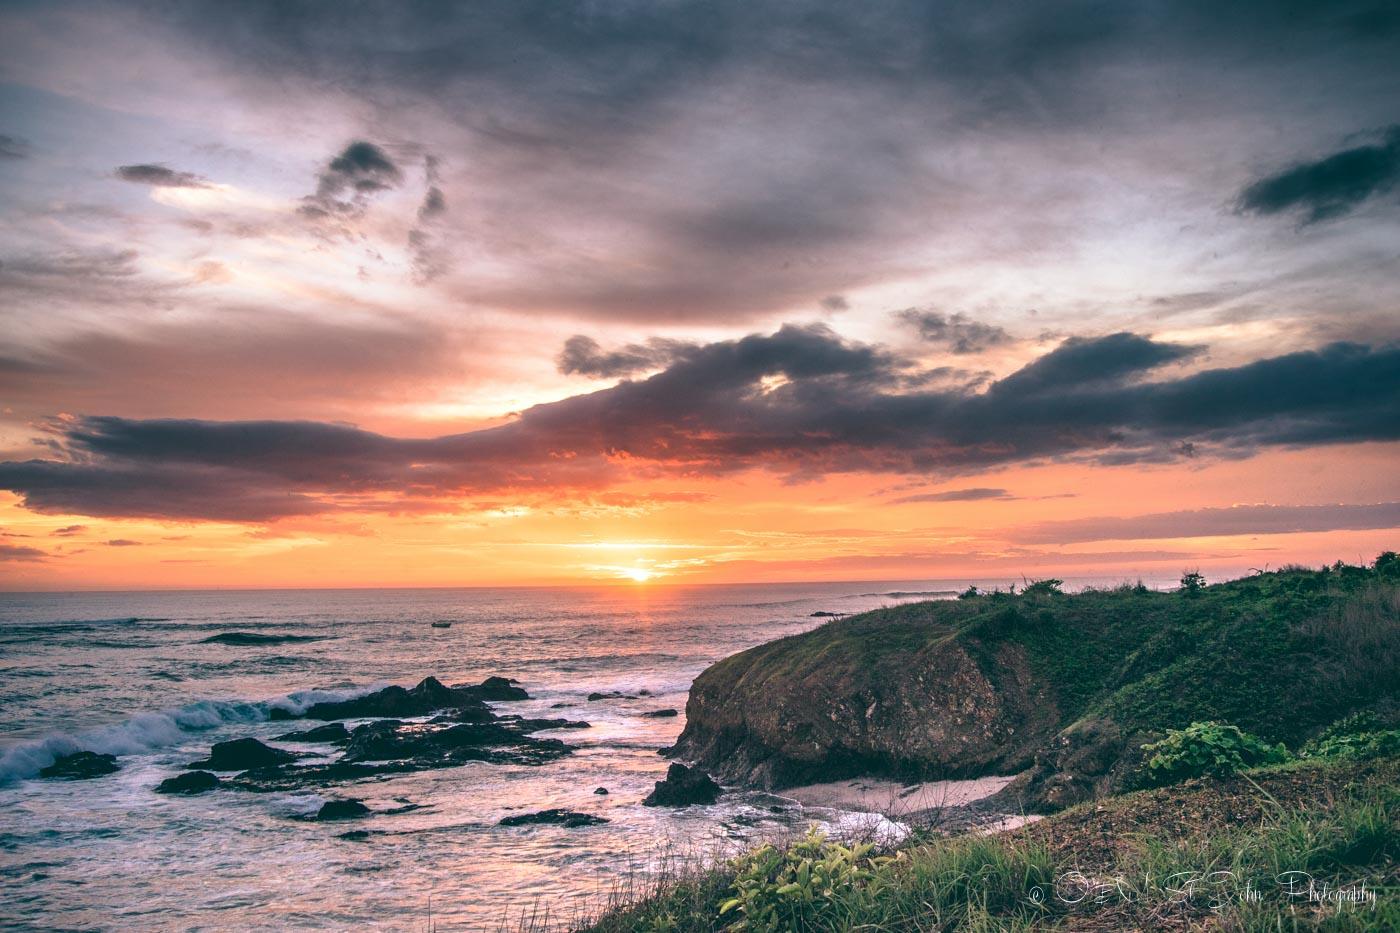 Sunset overlooking Playa Blanca in Guanacaste, Costa Rica